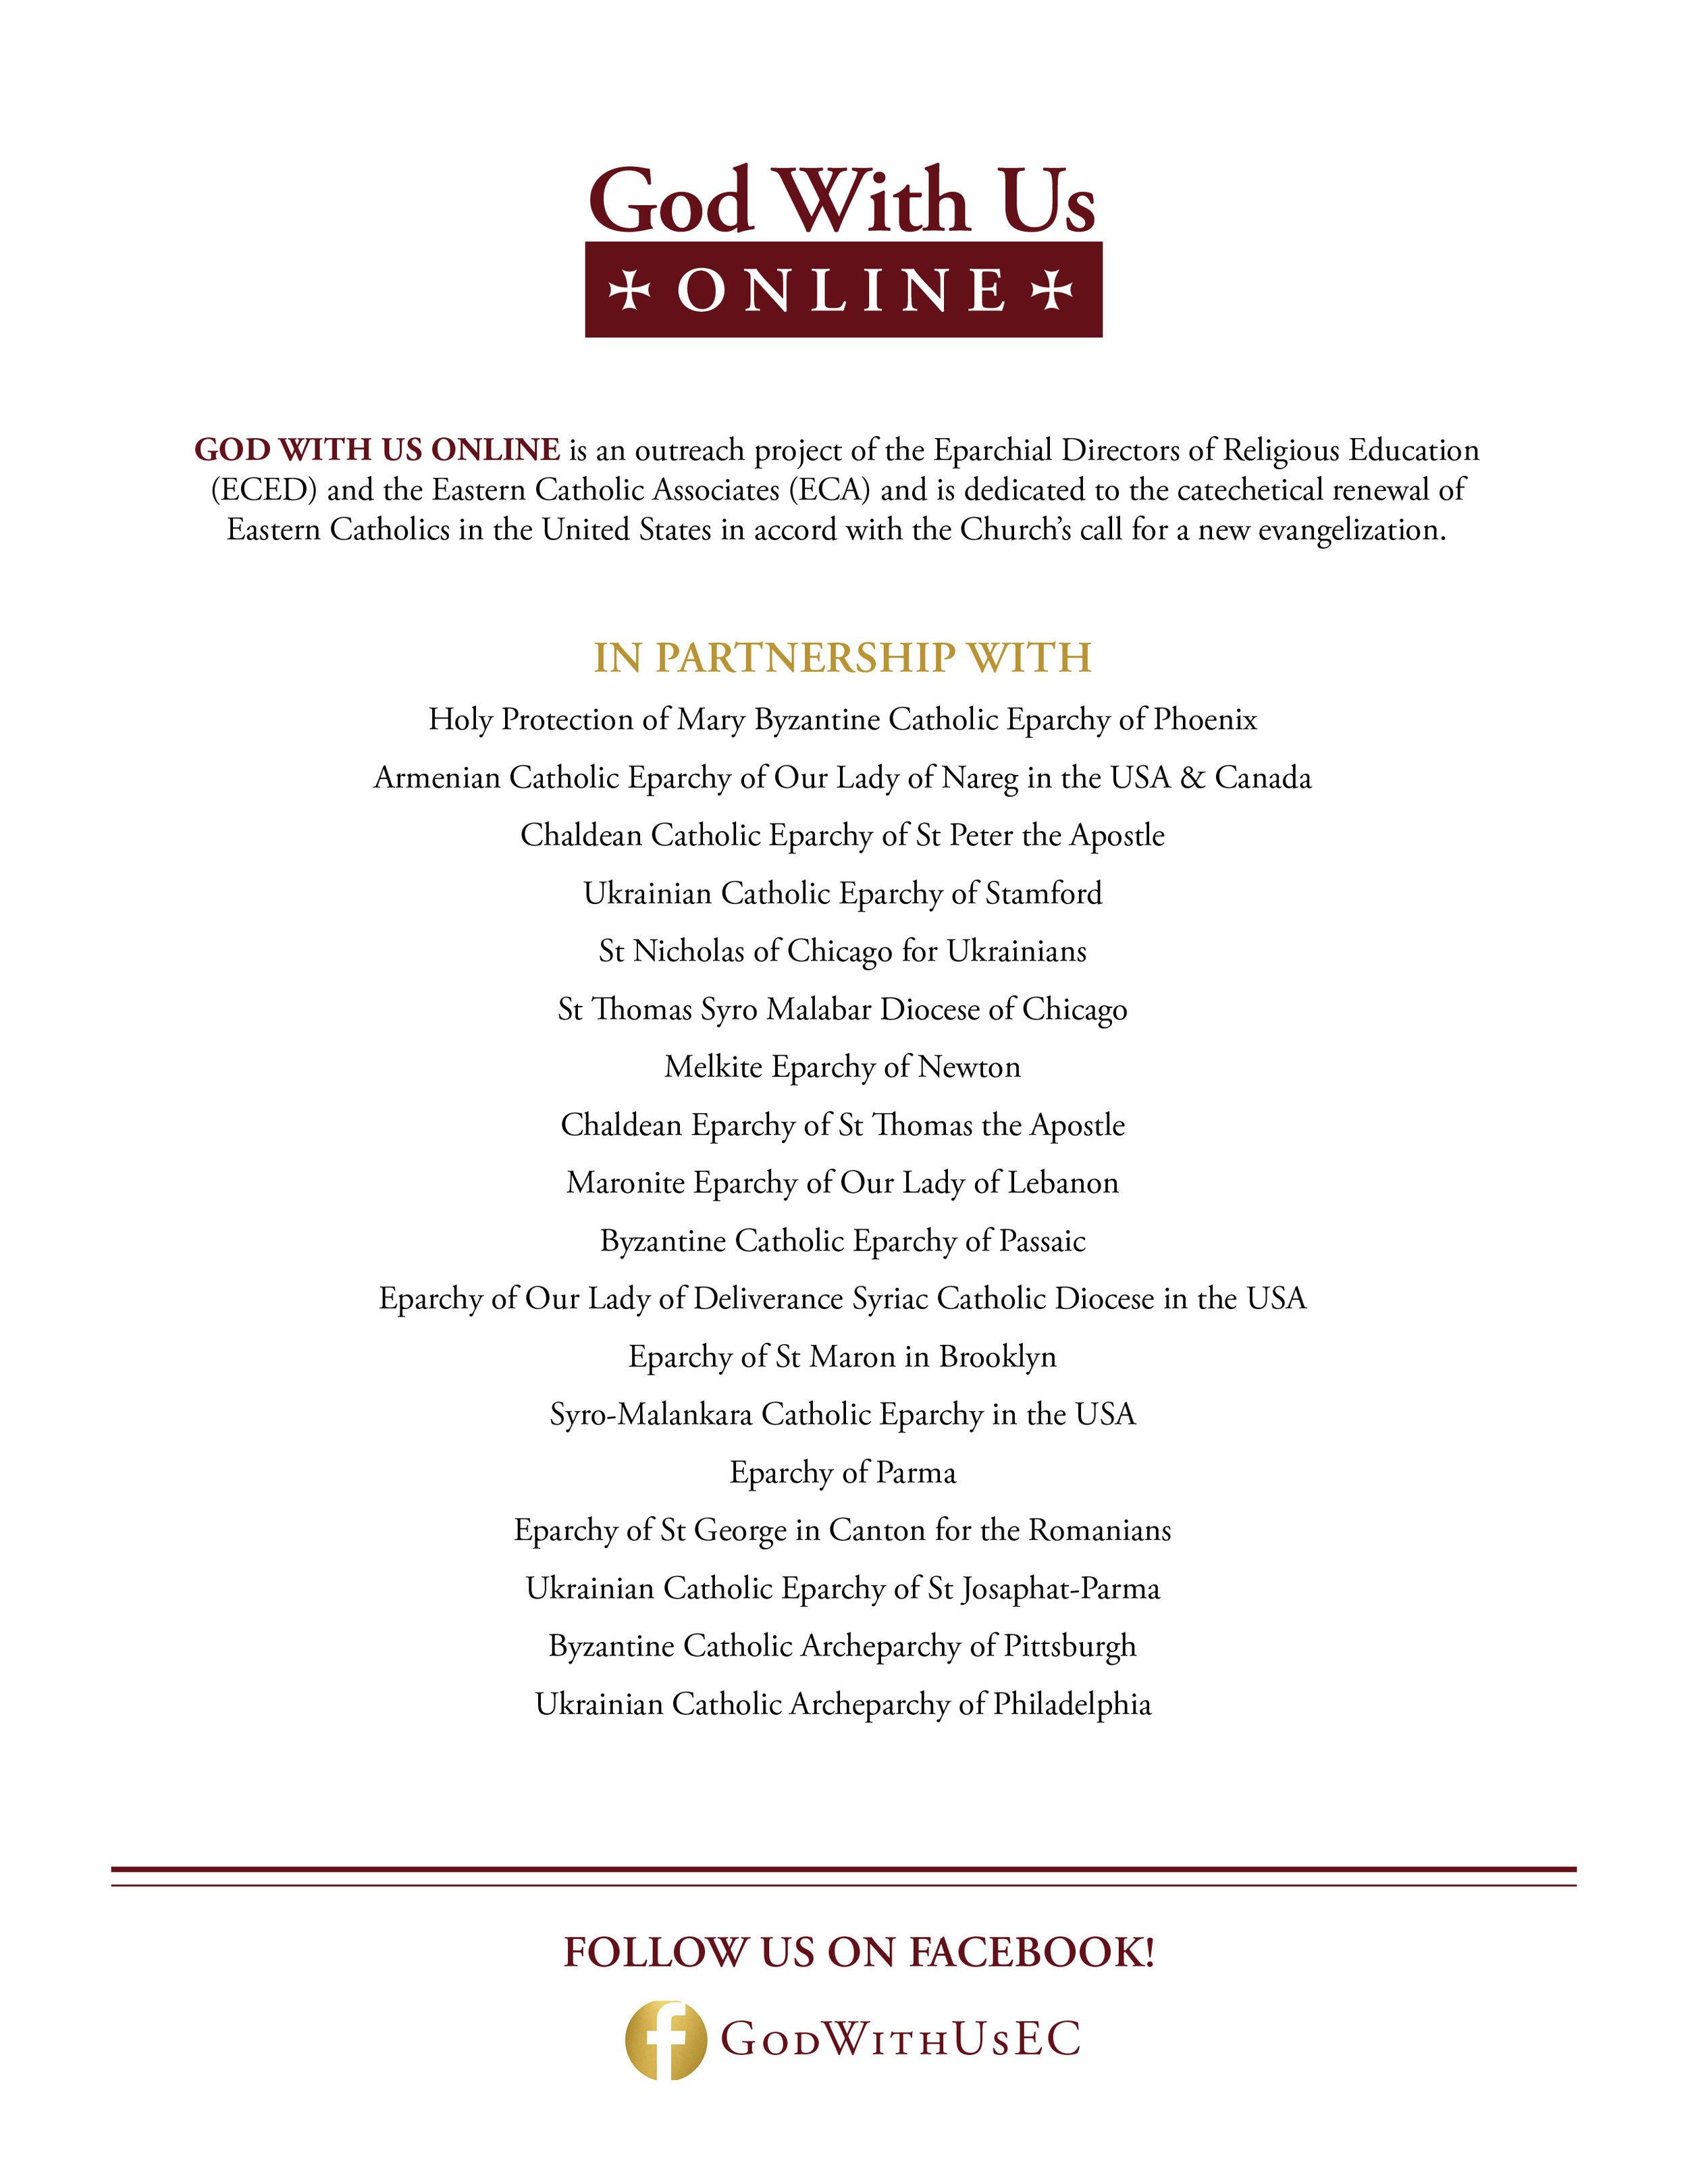 GWU Curriculum - side 2.jpg